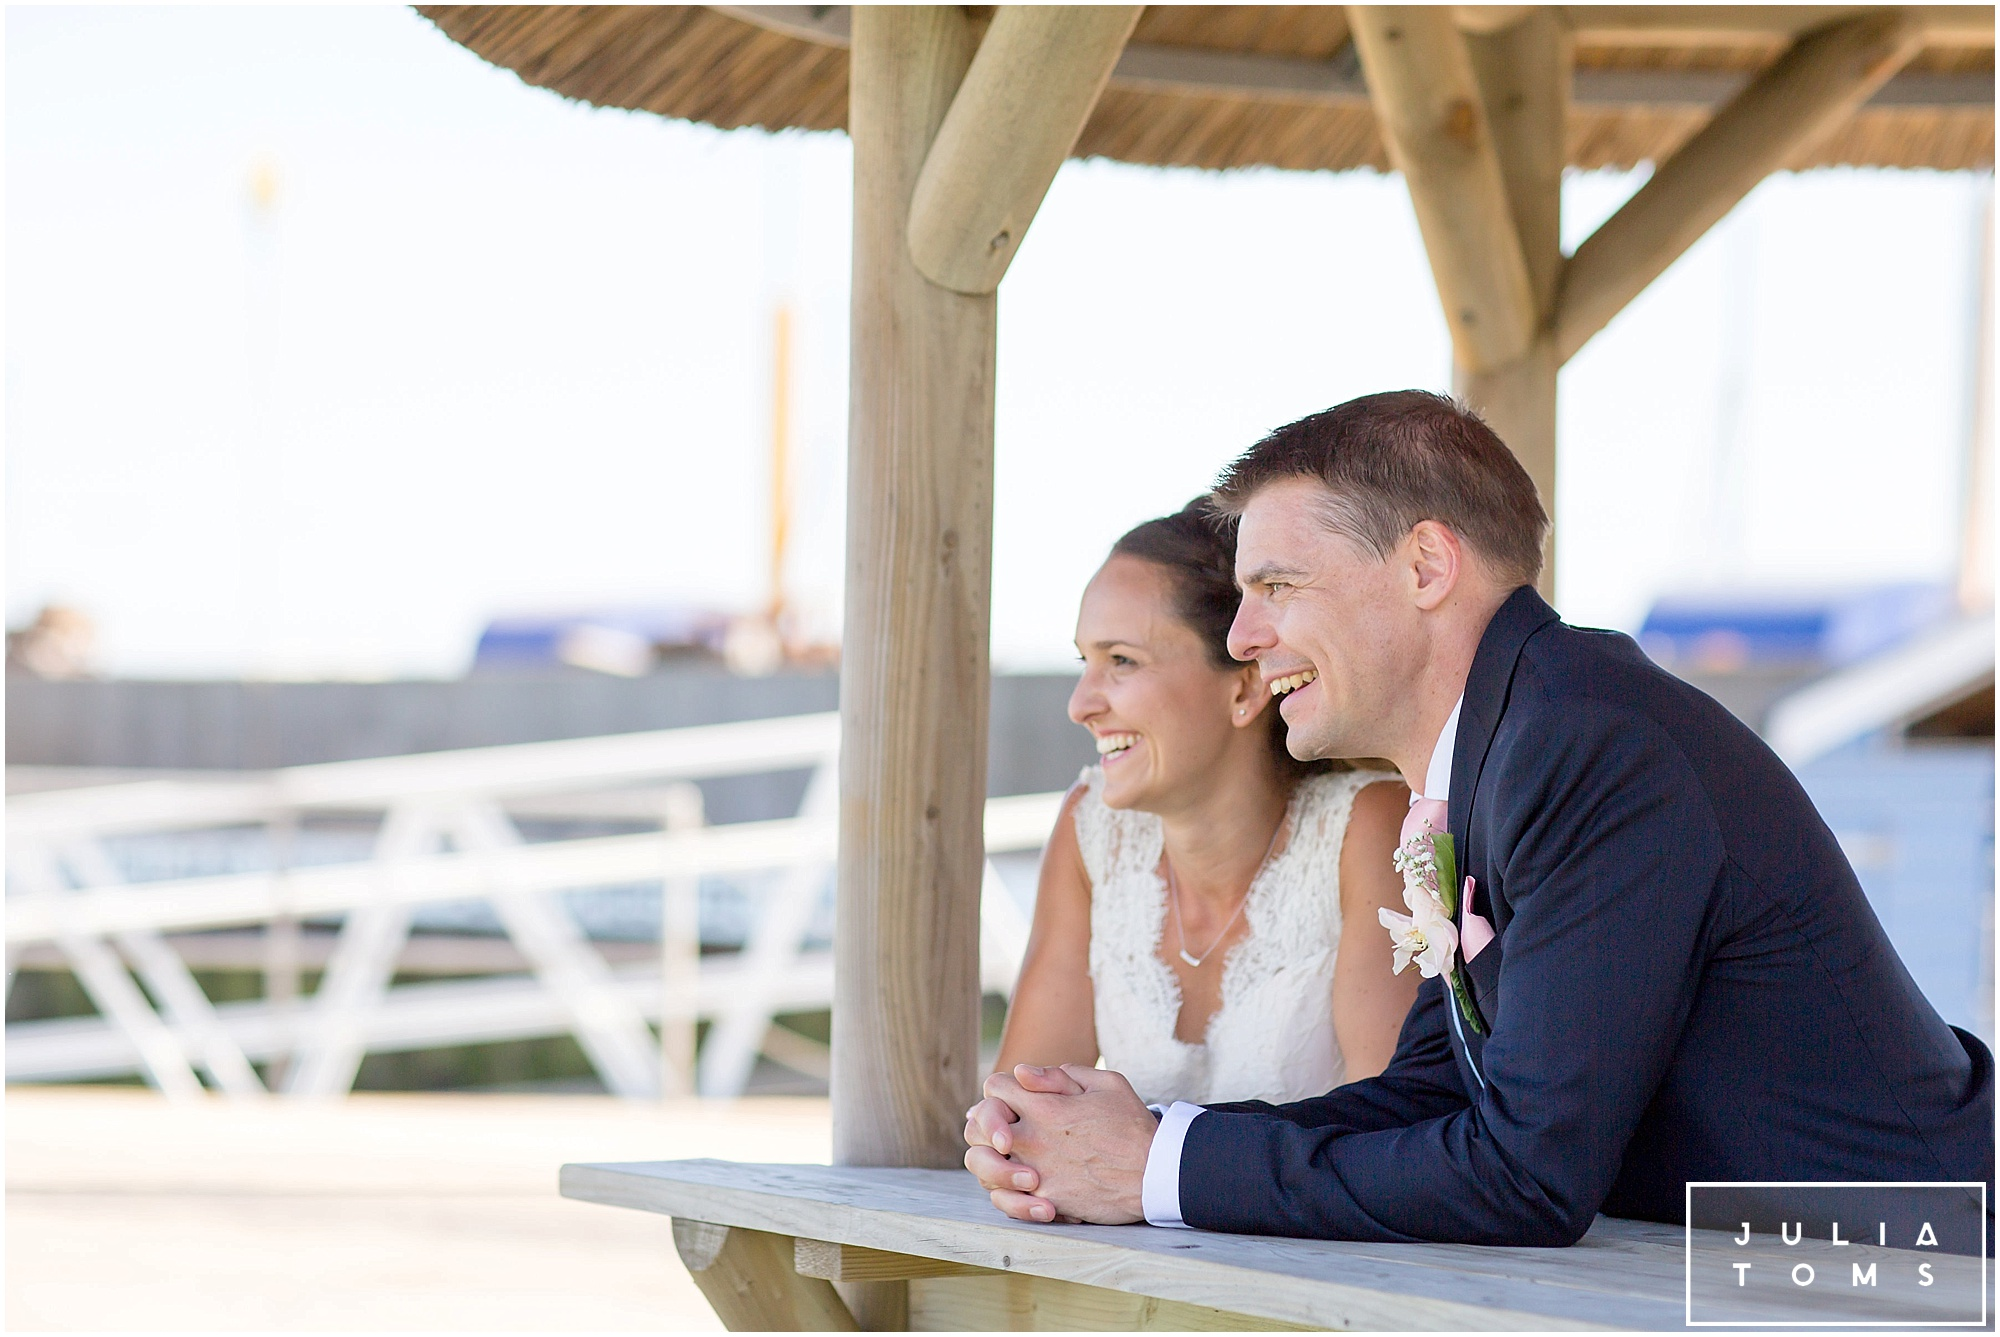 julia_toms_chichester_wedding_photographer_portsmouth_043.jpg